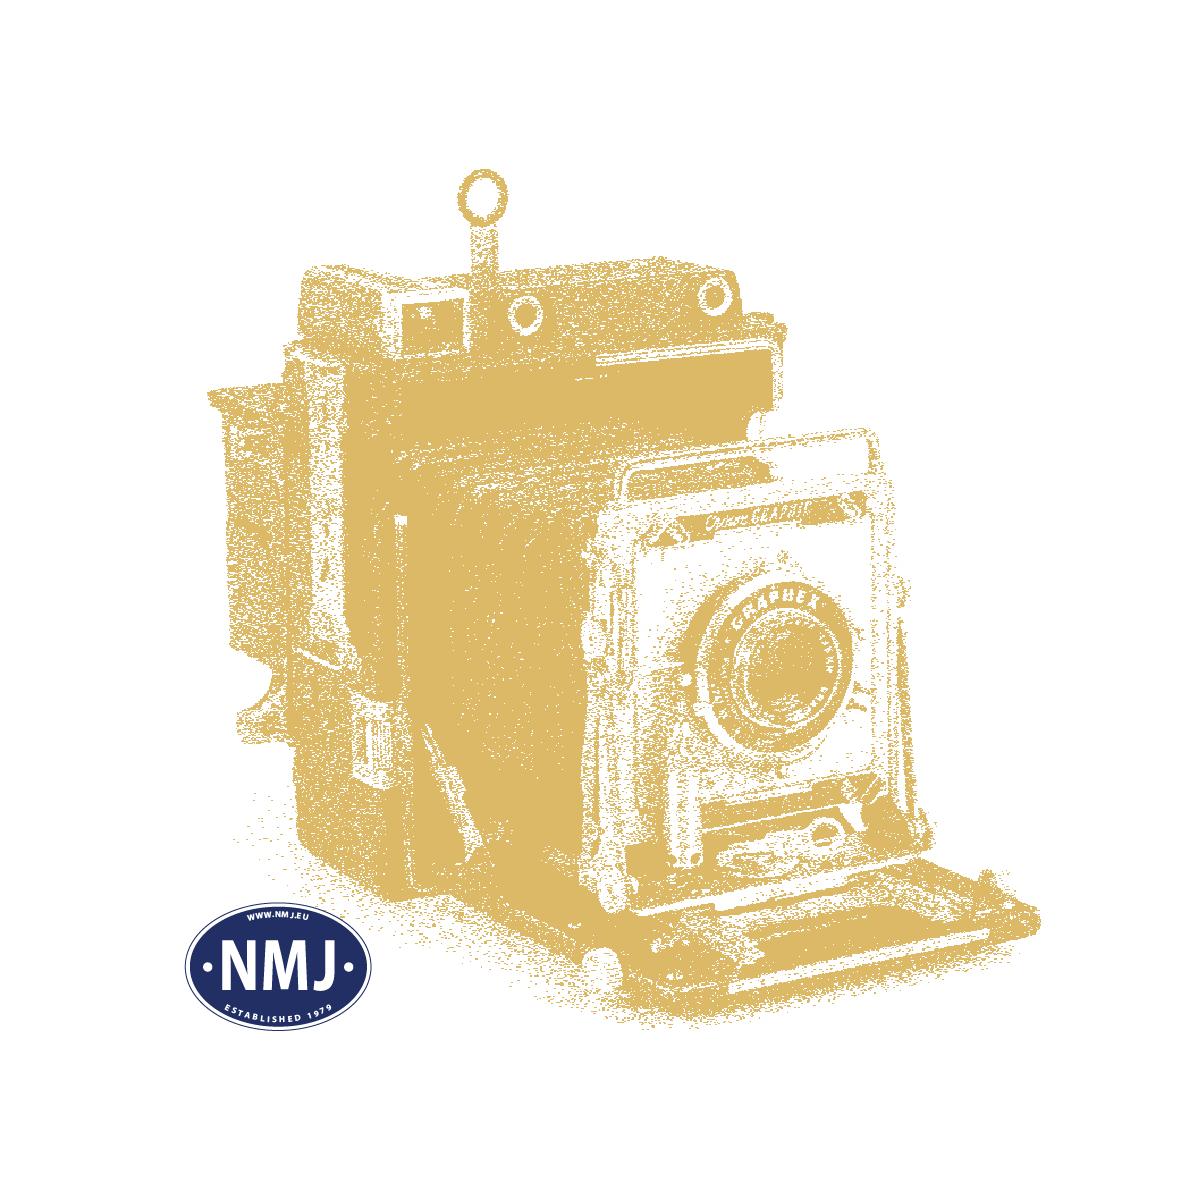 NMJT94002 - NMJ Topline SJ Y1 1275, Orange, DCC m/ Sound